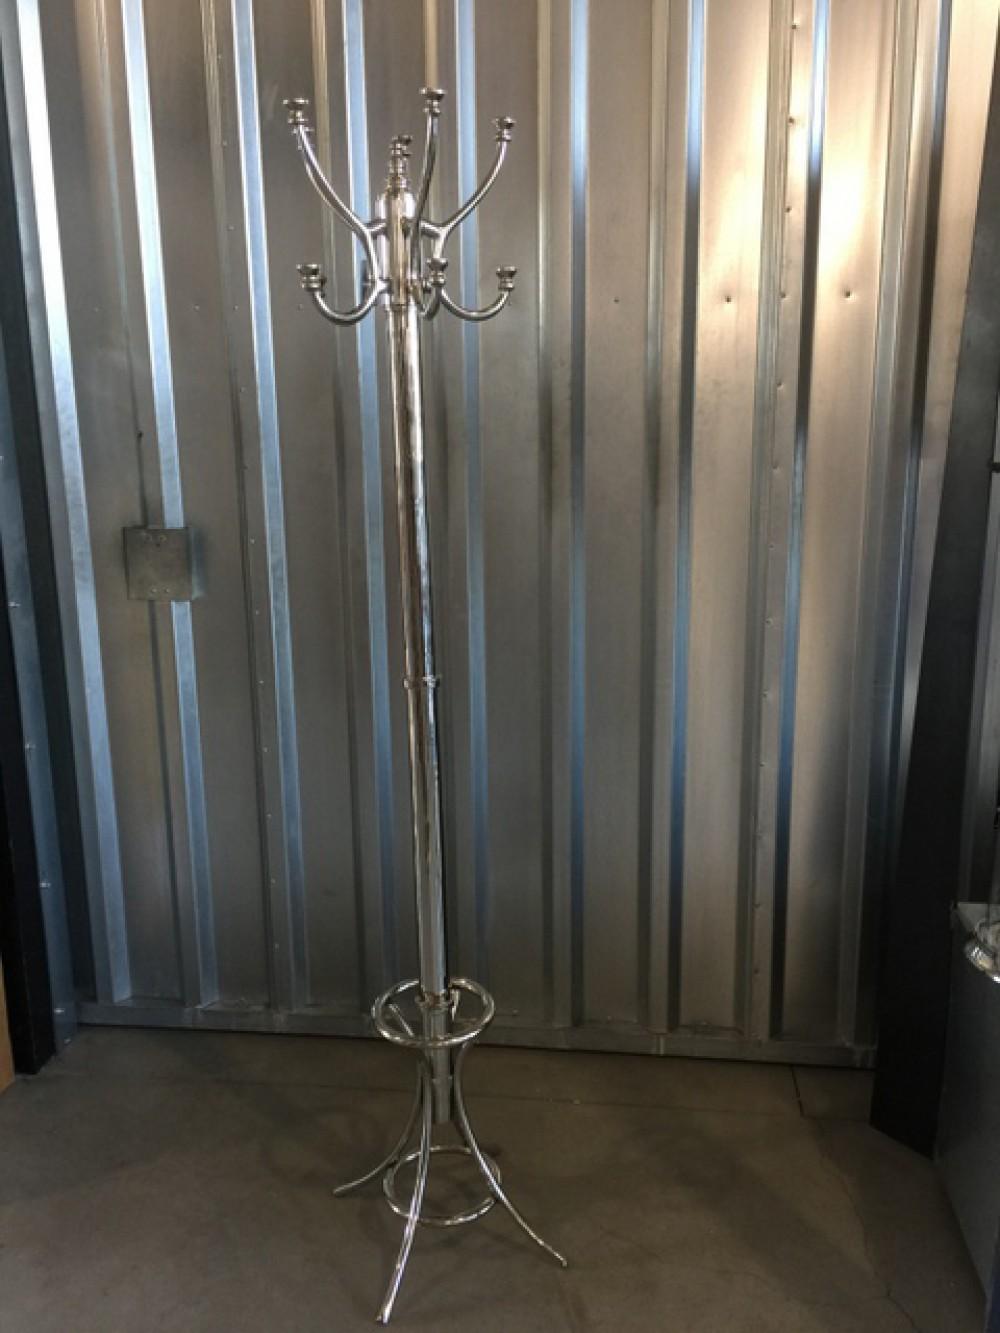 stehgarderobe metall silber garderobe silber landhaus h he 185 cm. Black Bedroom Furniture Sets. Home Design Ideas